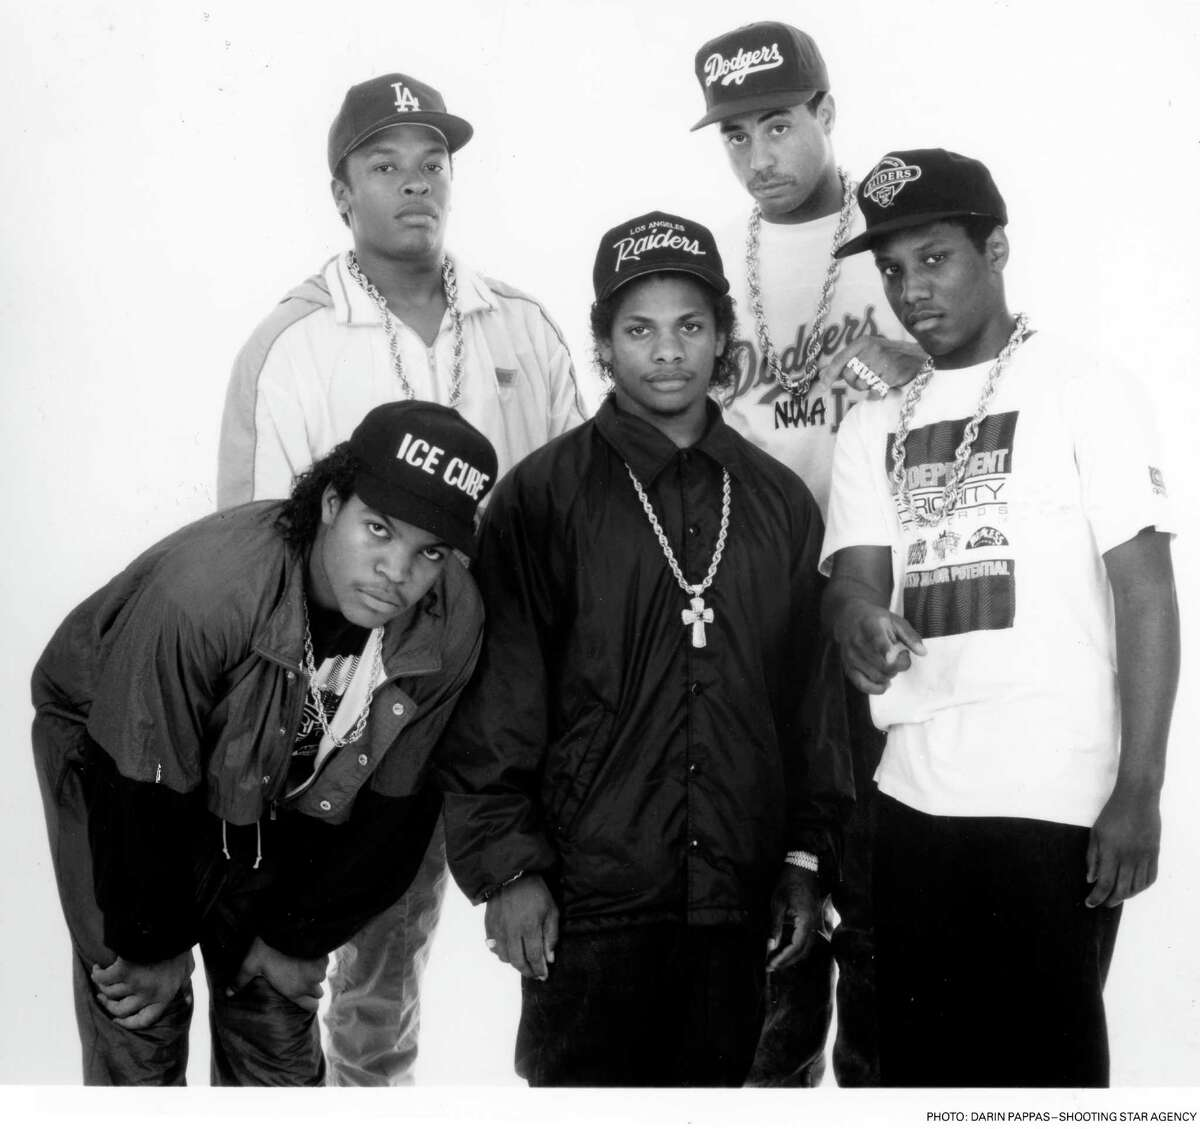 N.W.A. - (L-R) Ice Cube, Dr. Dre, Eazy-E, Yella, M.C. Ren